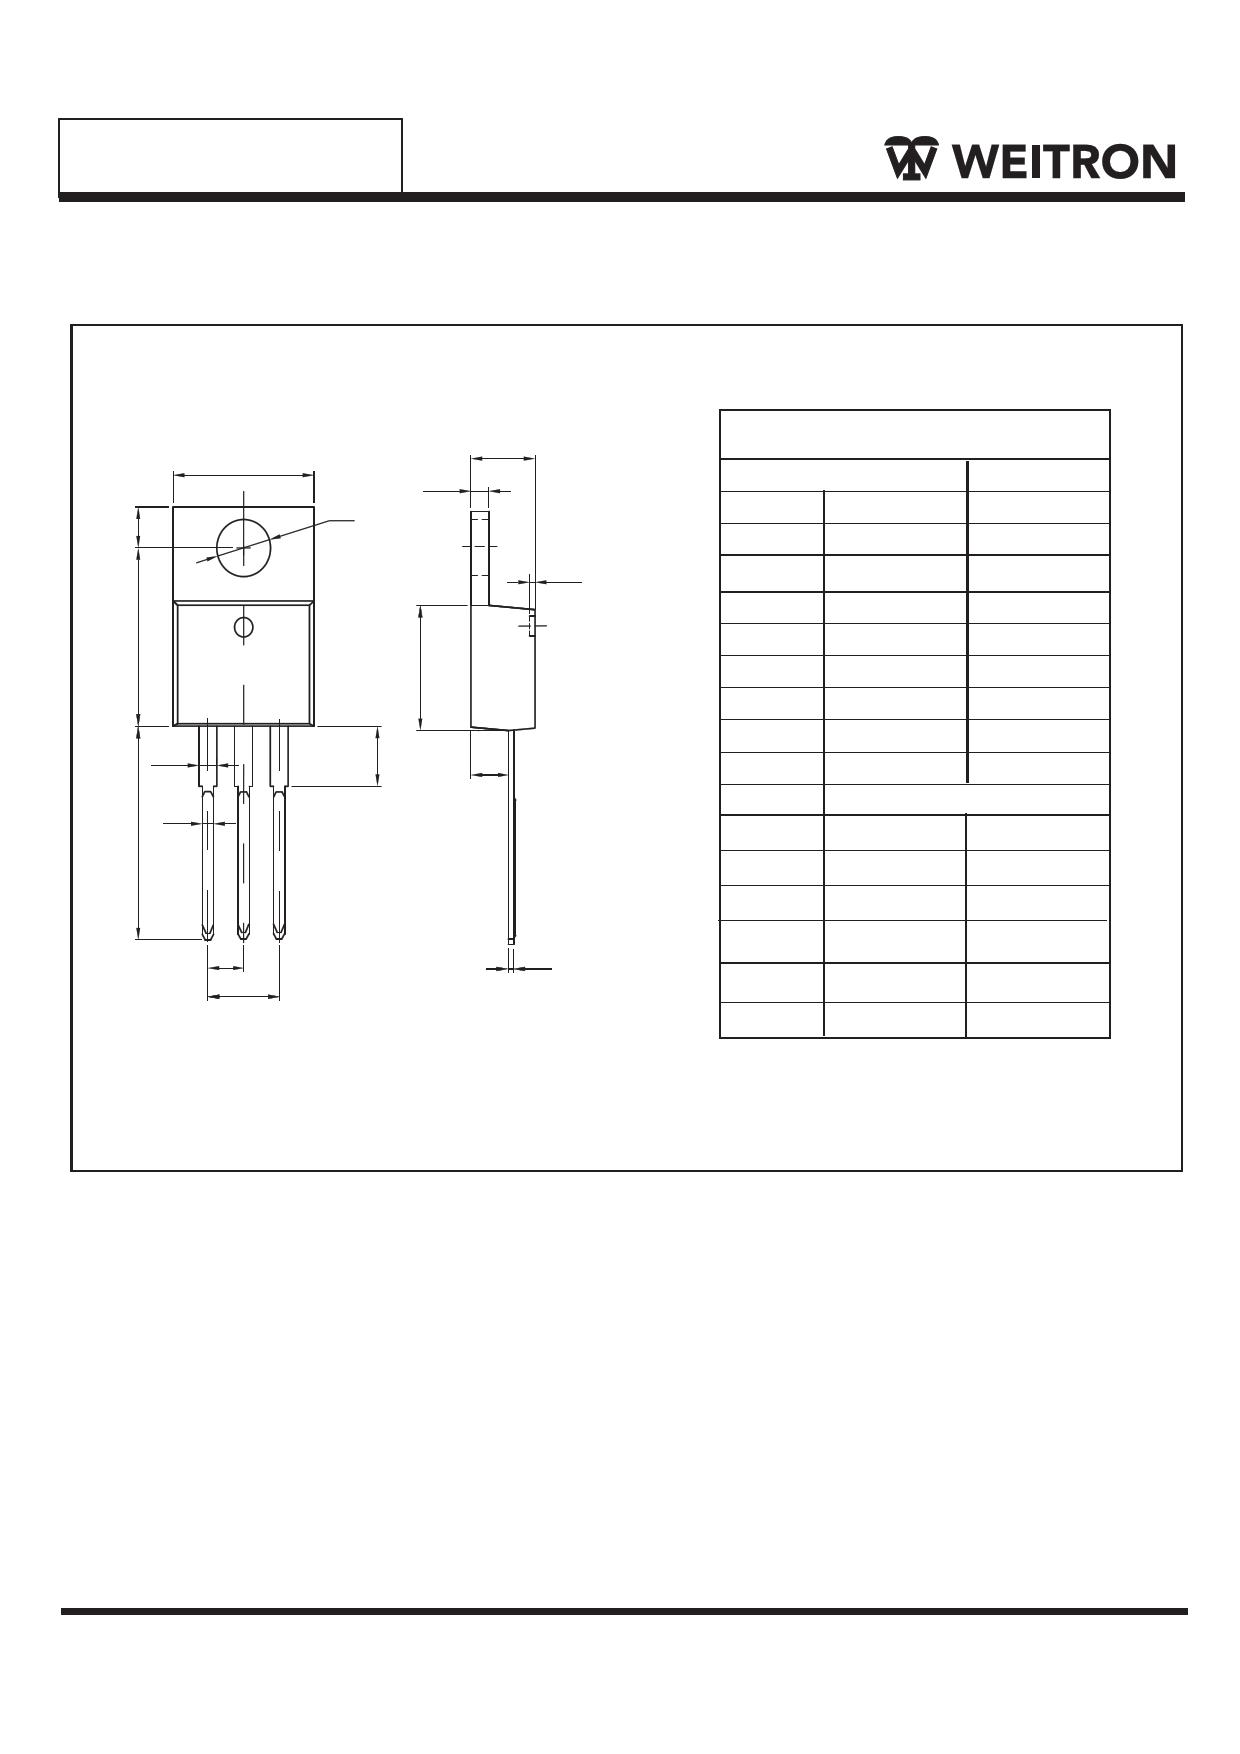 TIP120 pdf pinout